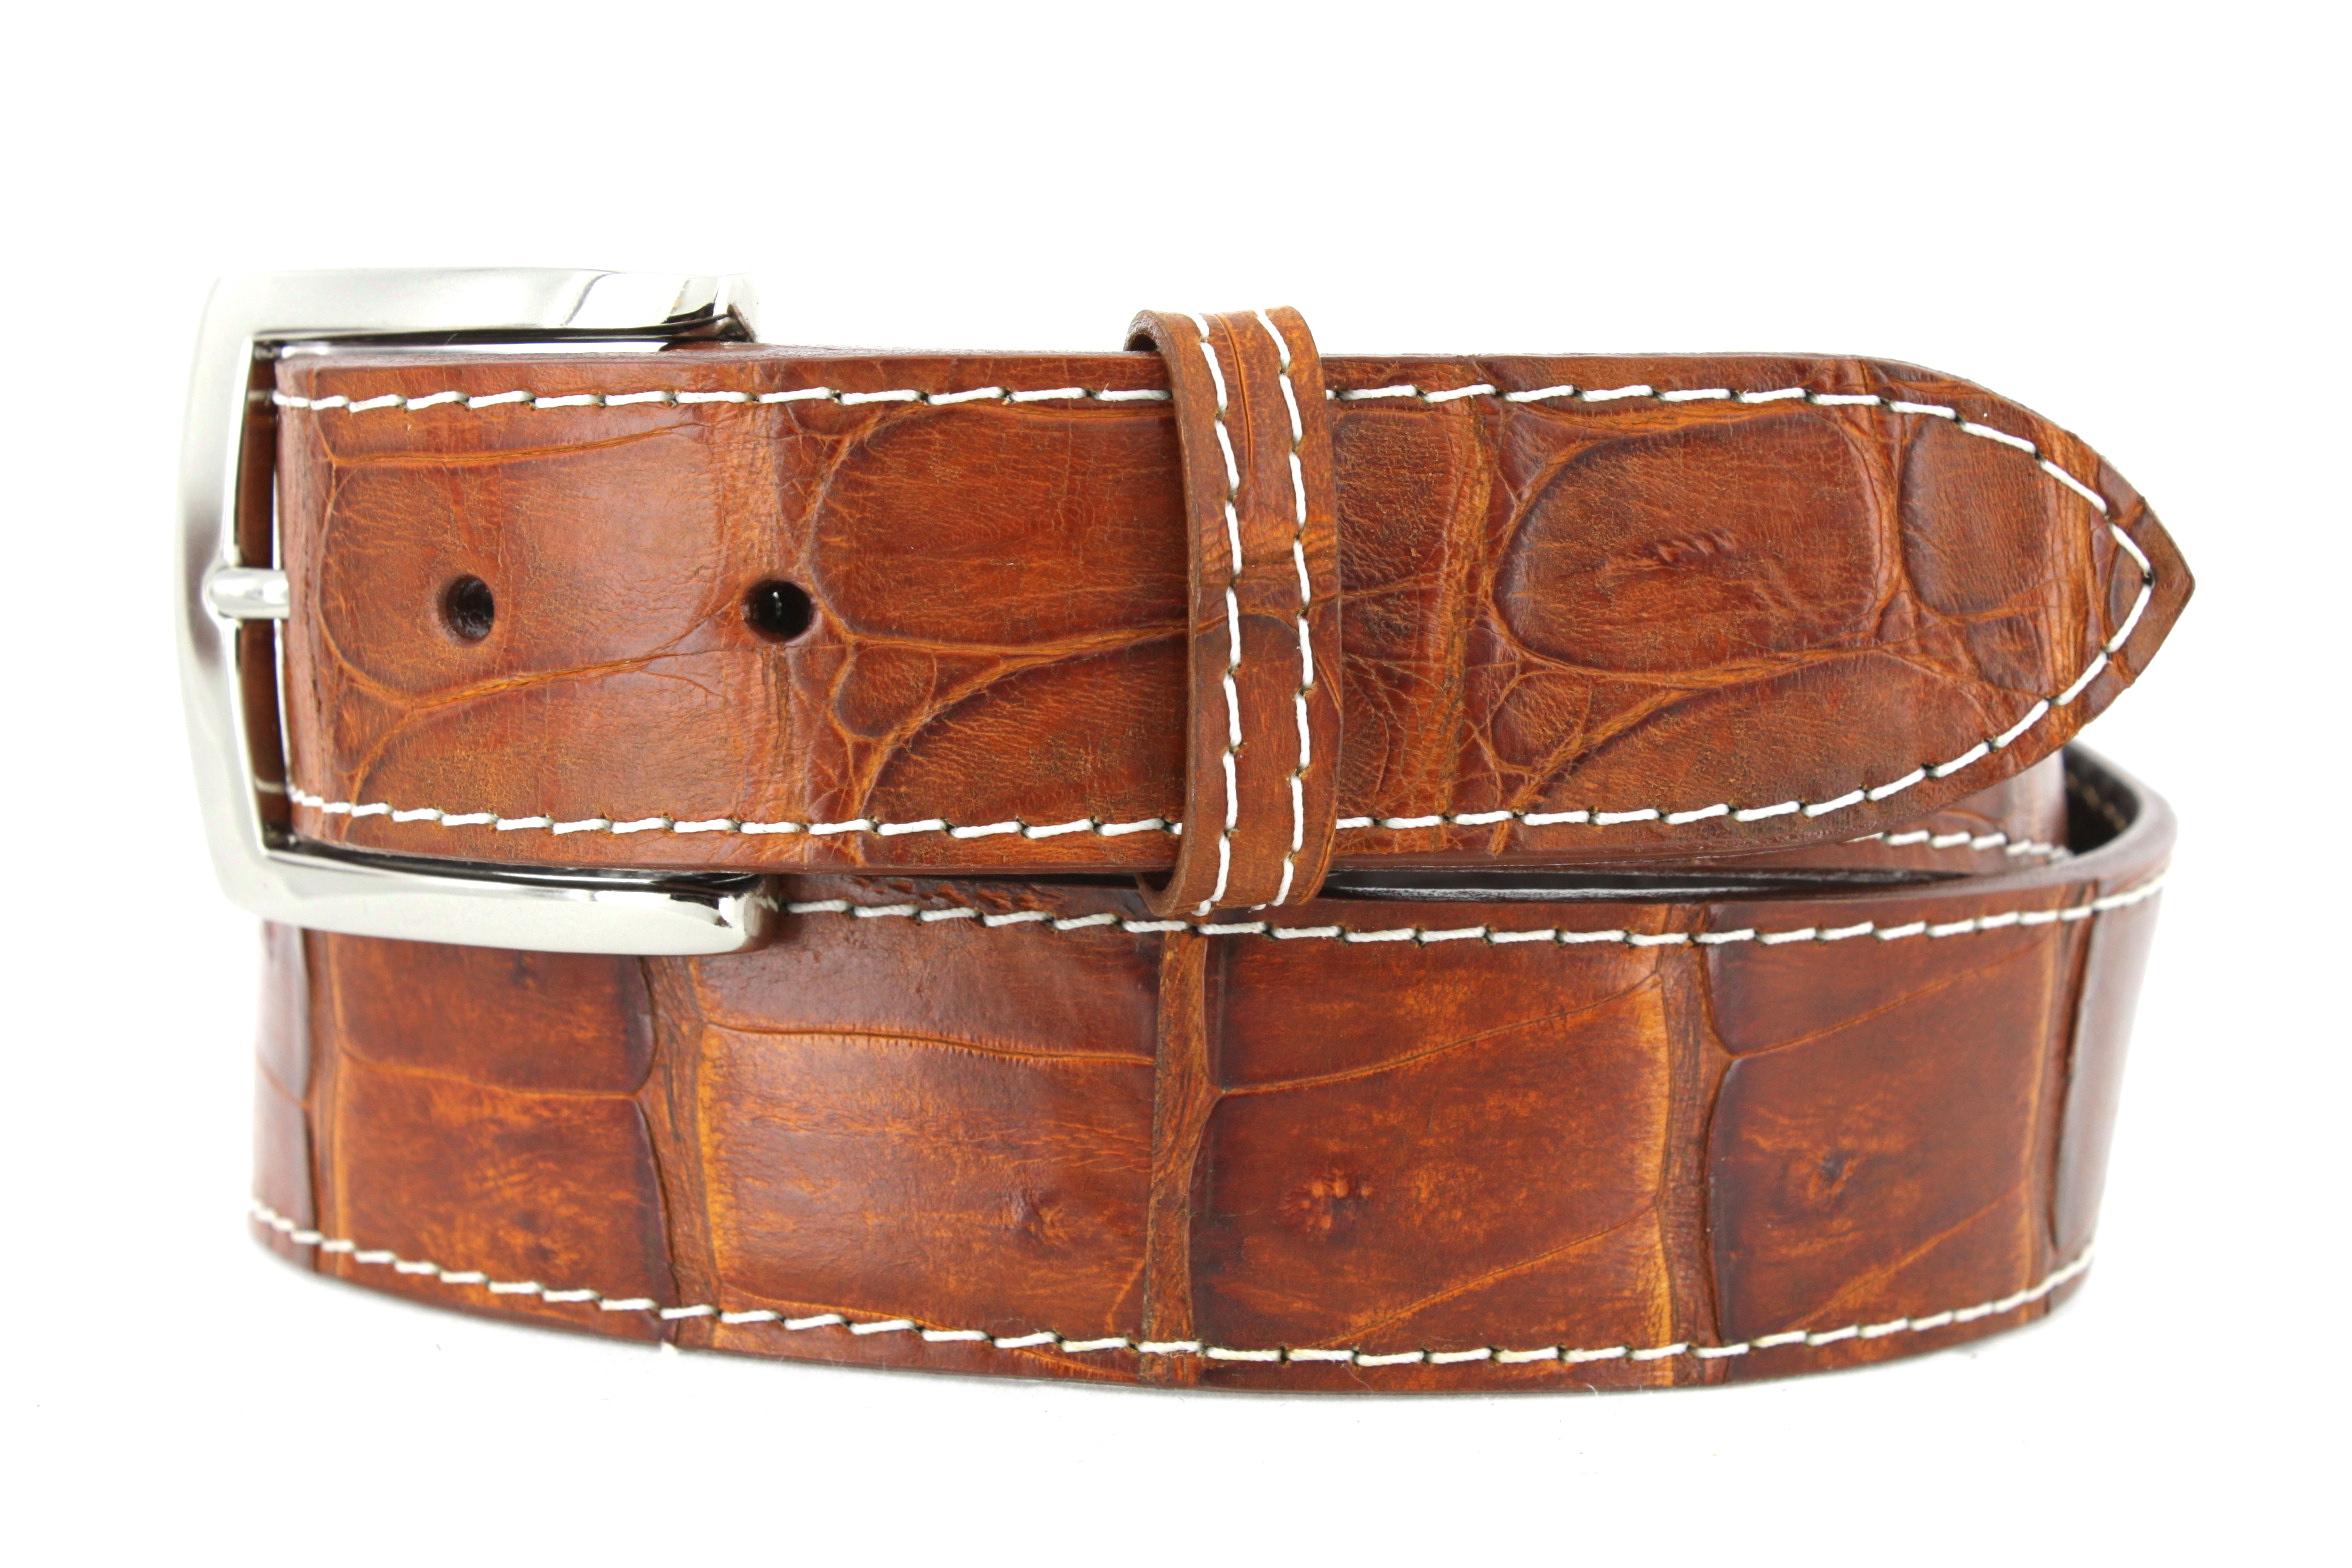 76a615a1f49 Handmade Genuine Crocodile Golf Belts